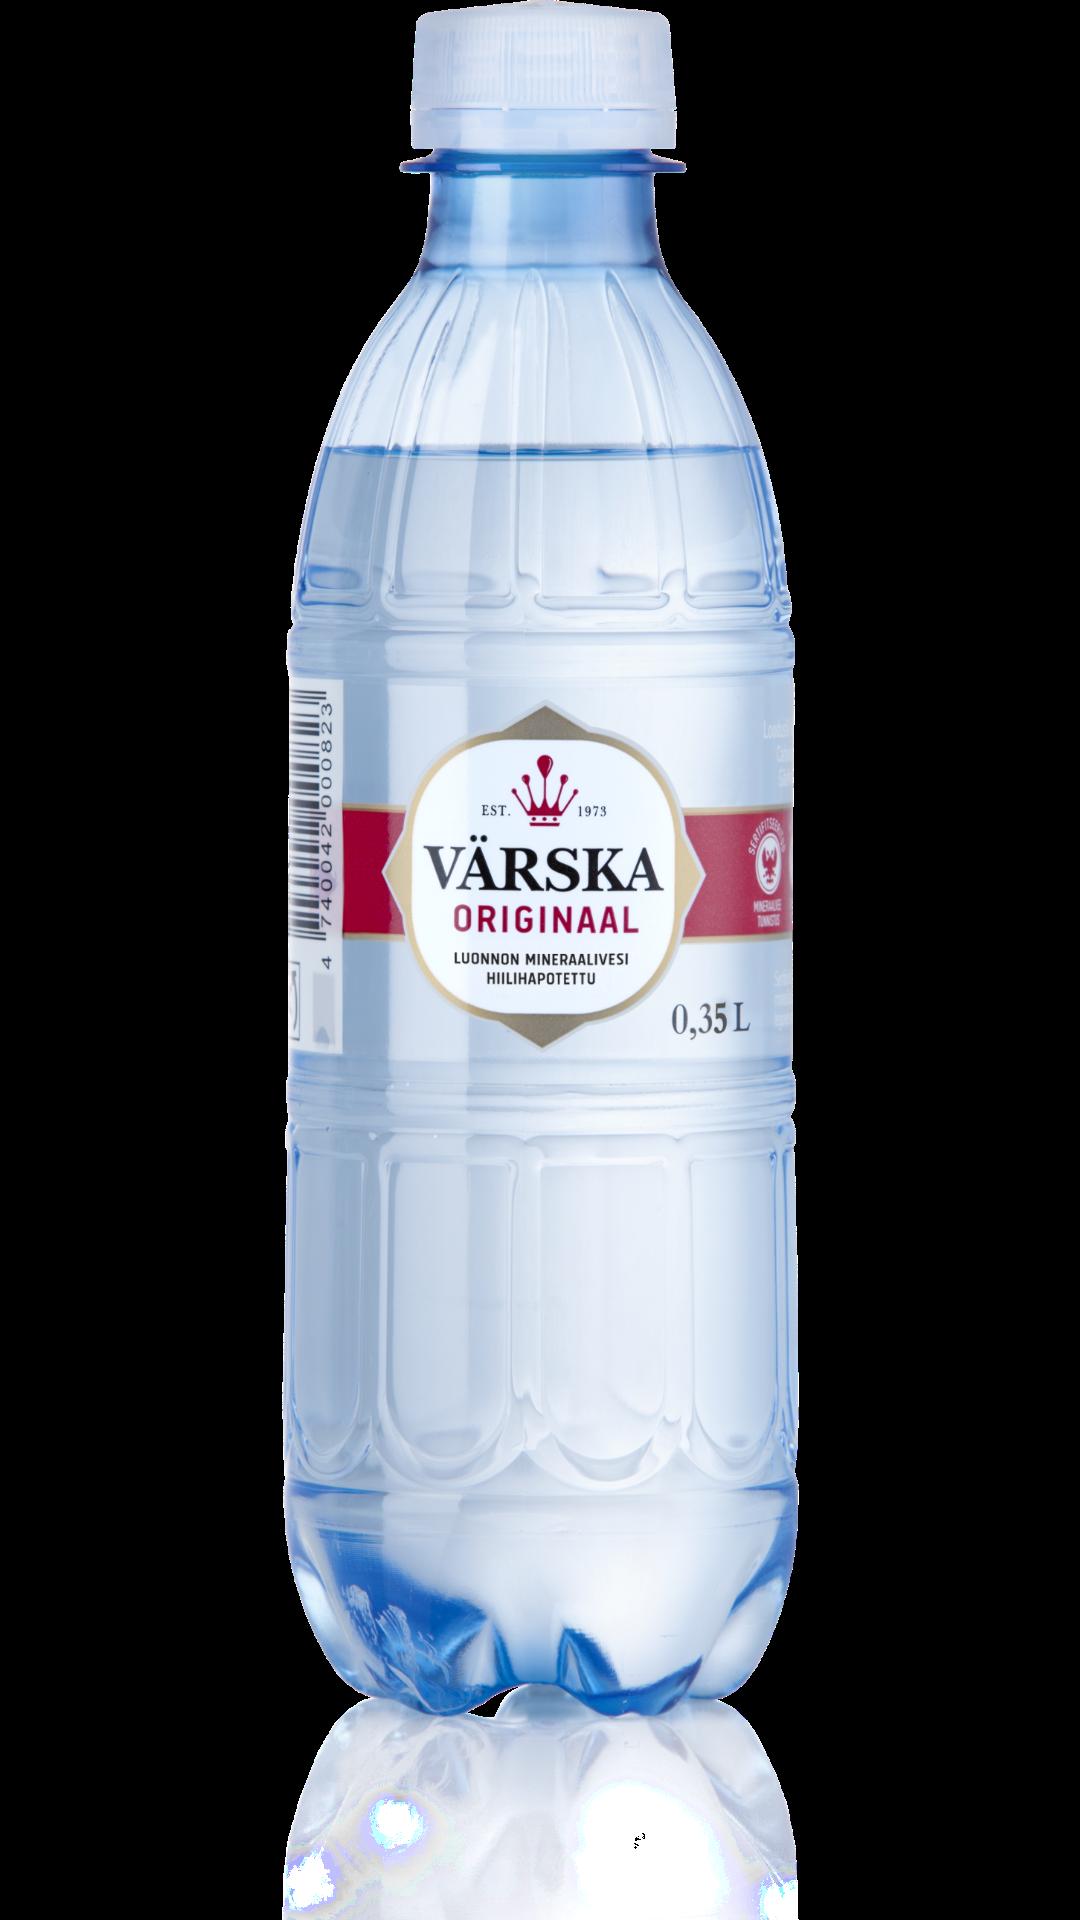 VarskaOriginaal_fin_0,35PET_pdl